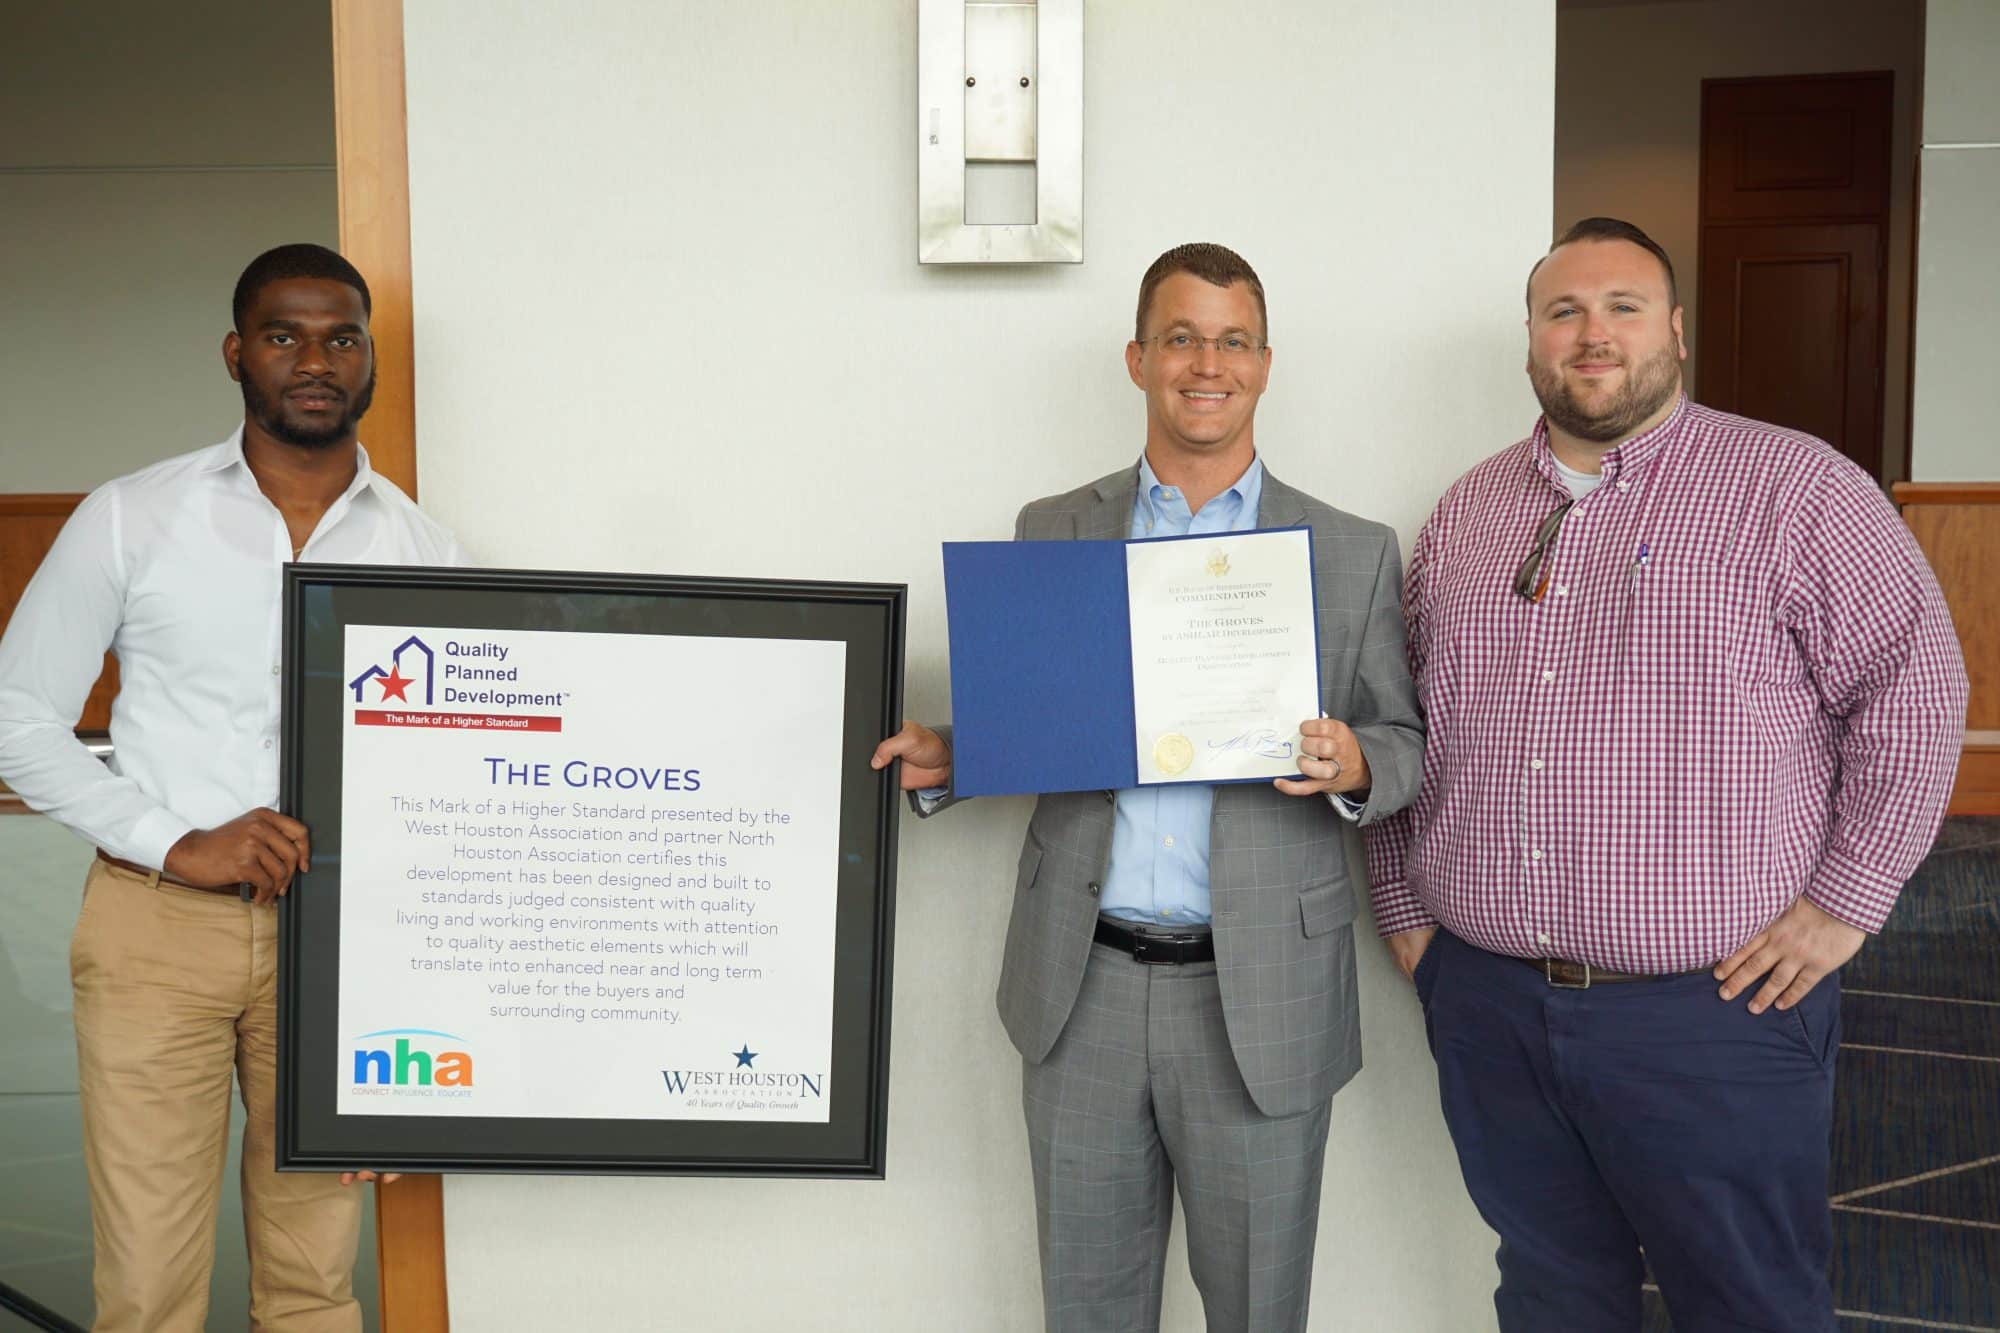 Ashlar team members Royce Brooks, Mike Miller and Brad McFarland with award